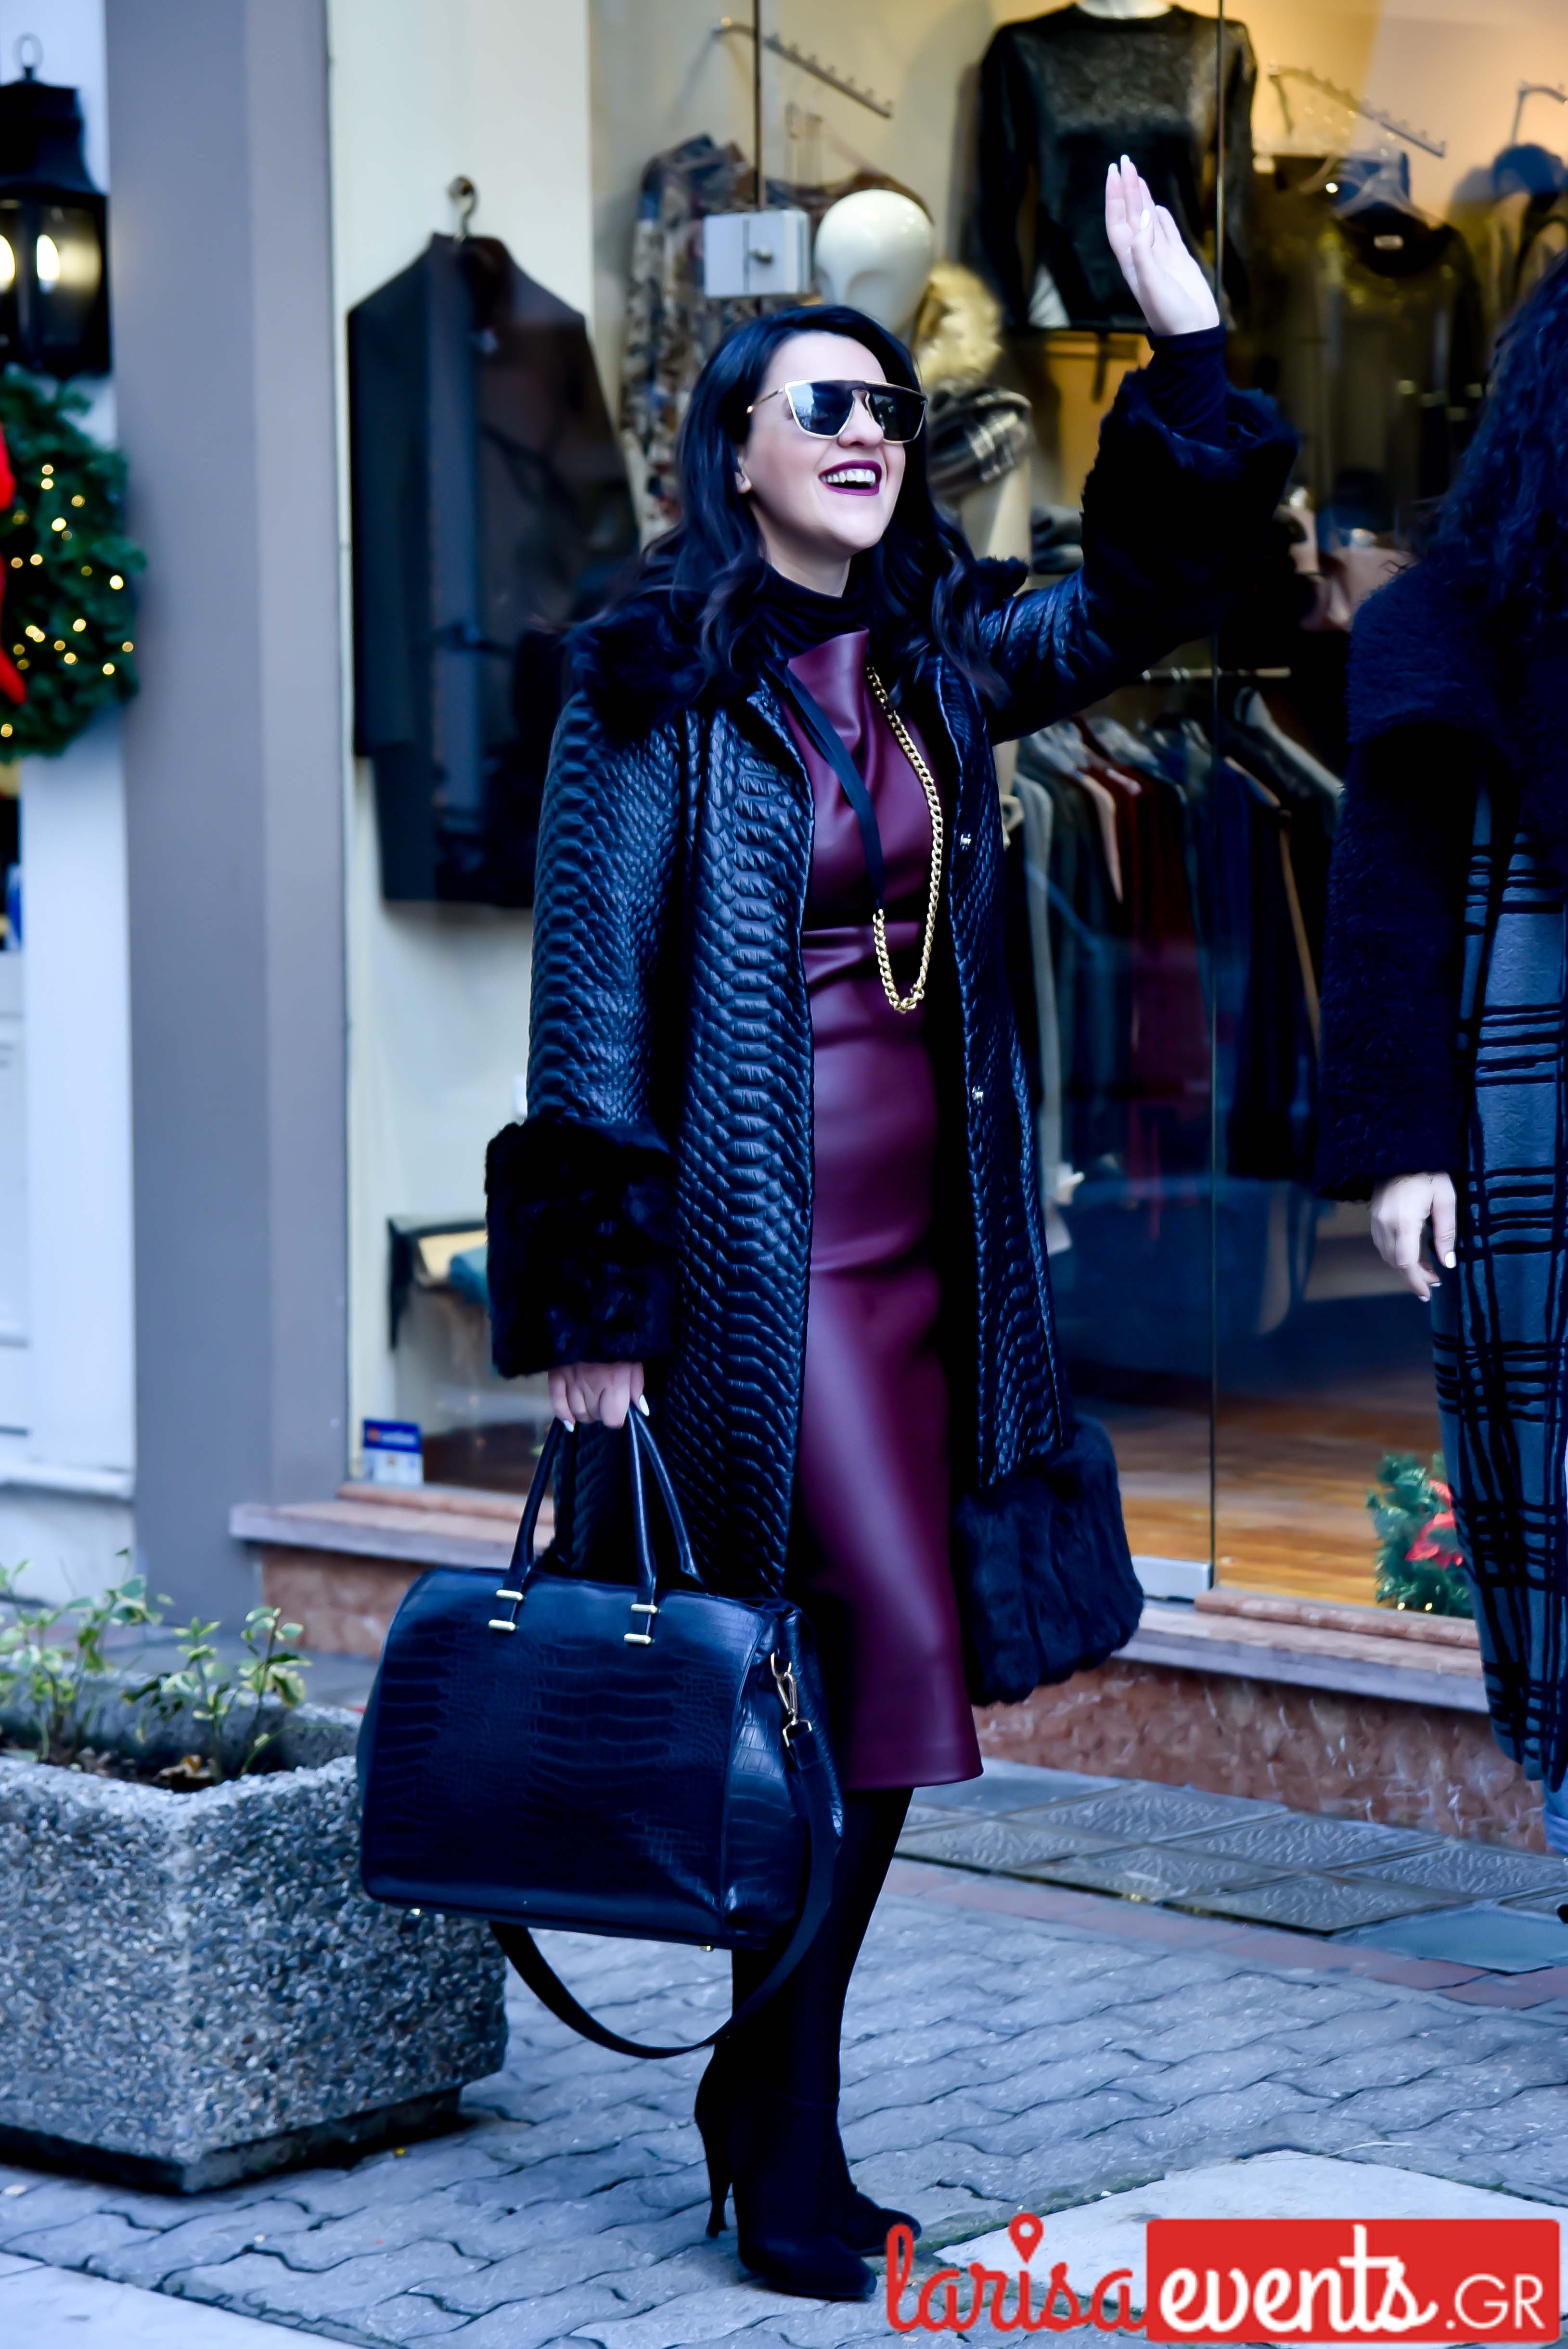 LAZ 7339 - Λάρισα's Street Style | Οι γυναίκες της πόλης σε street style clicks!